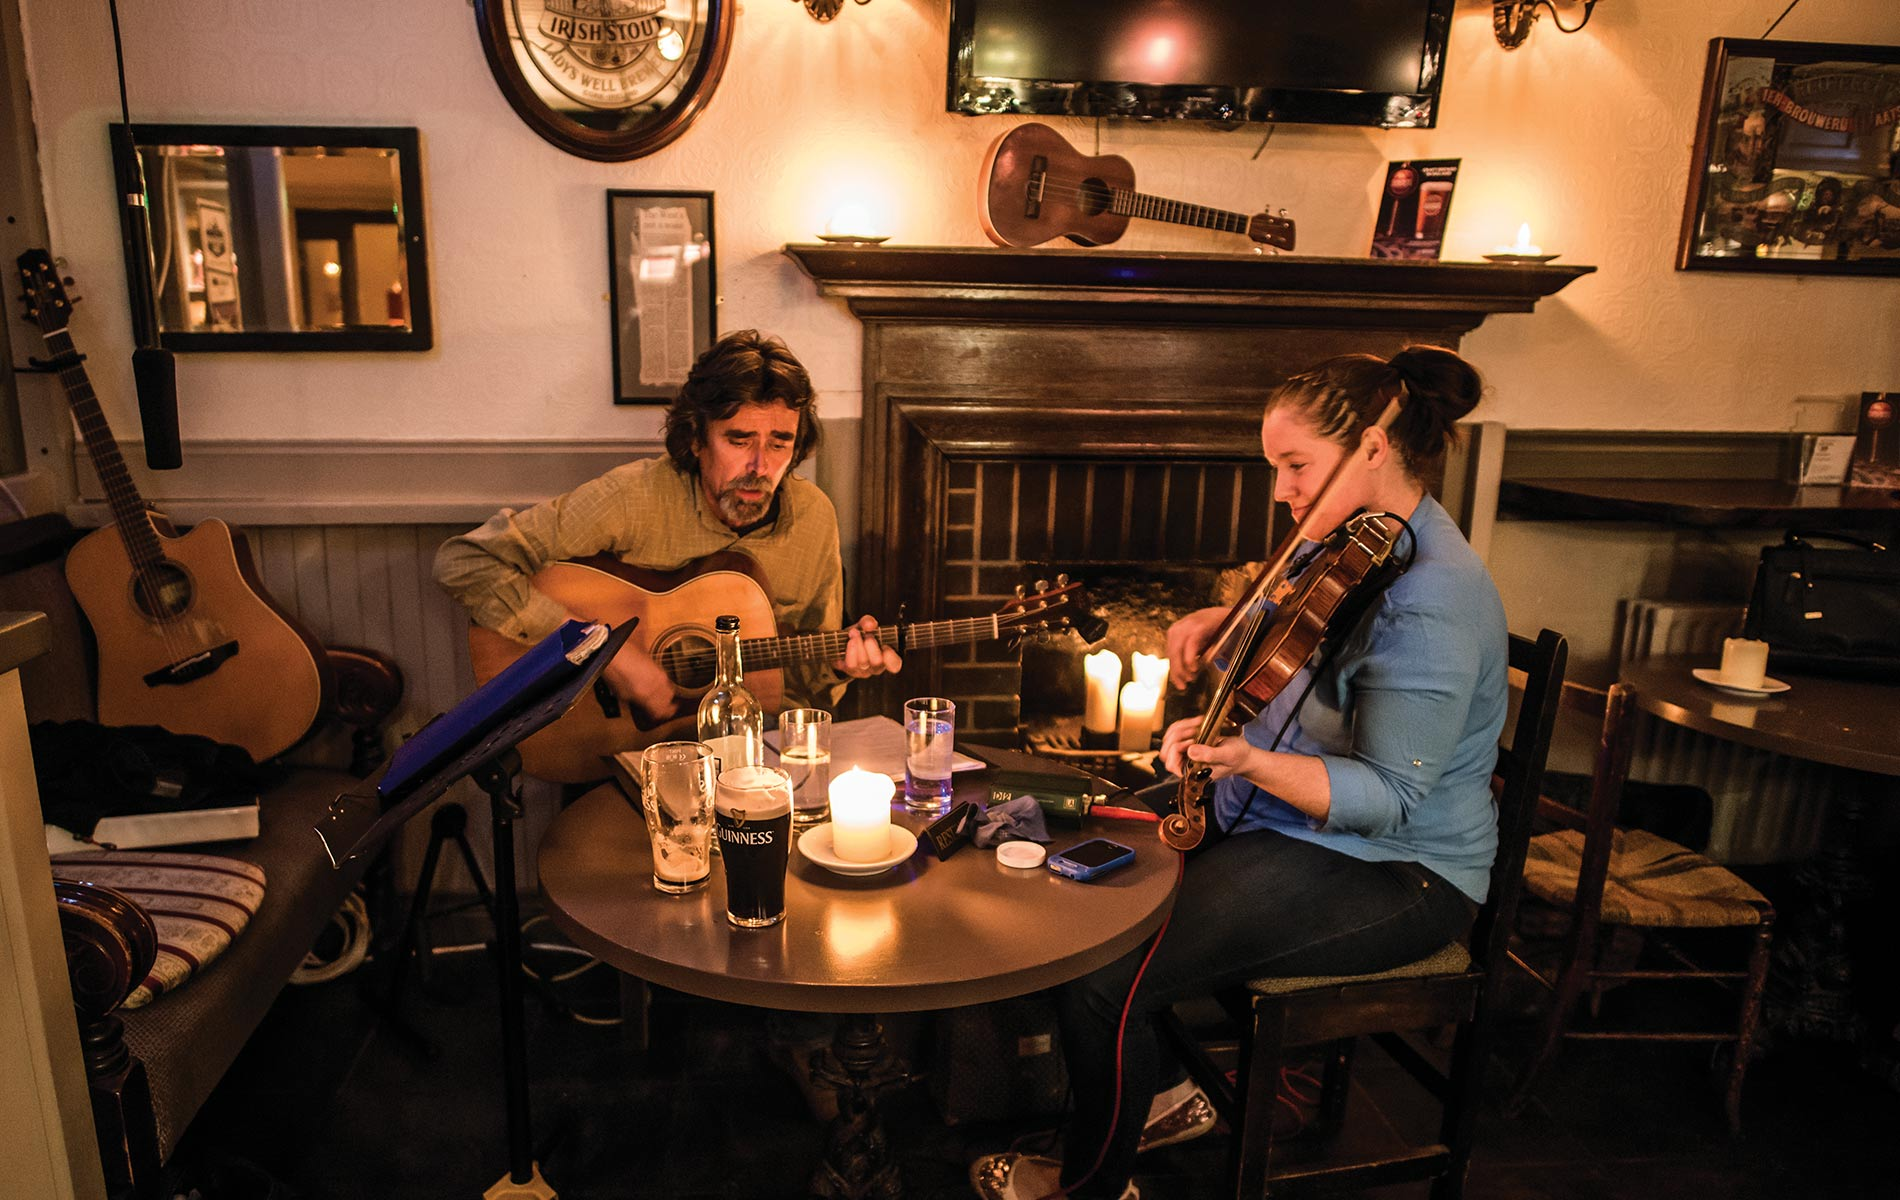 Couple playing music in Irish pub